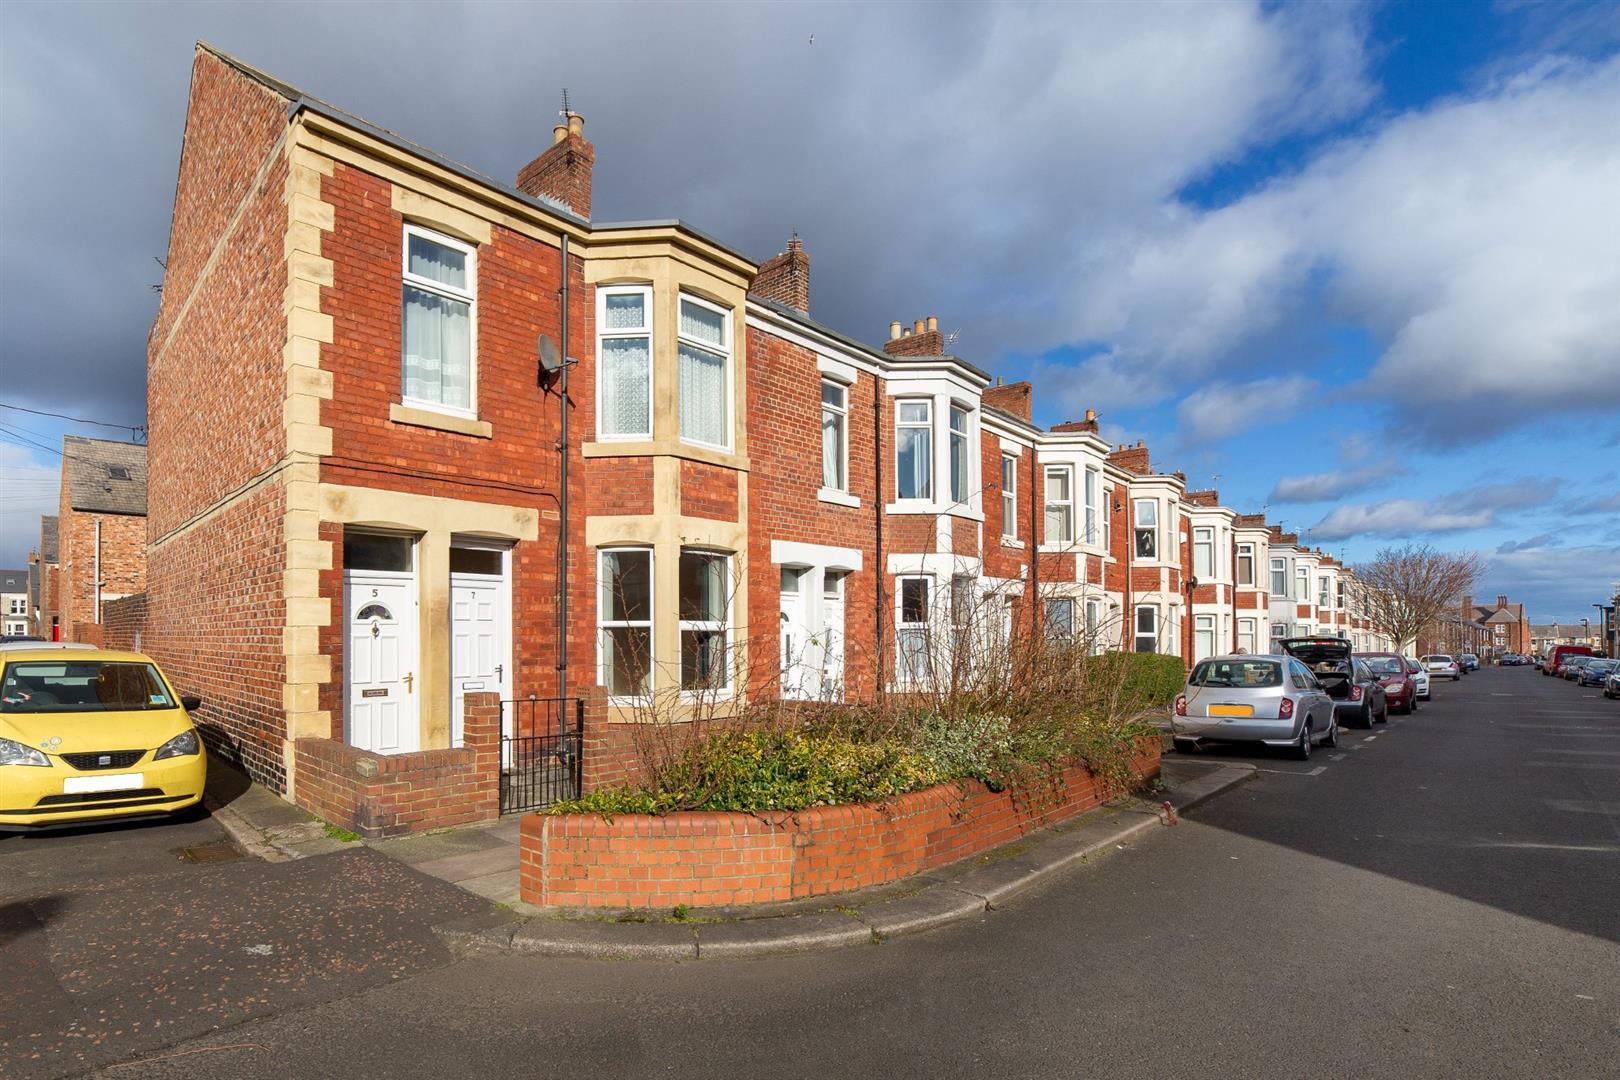 2 bed flat to rent in Newcastle Upon Tyne, NE6 5XY, NE6